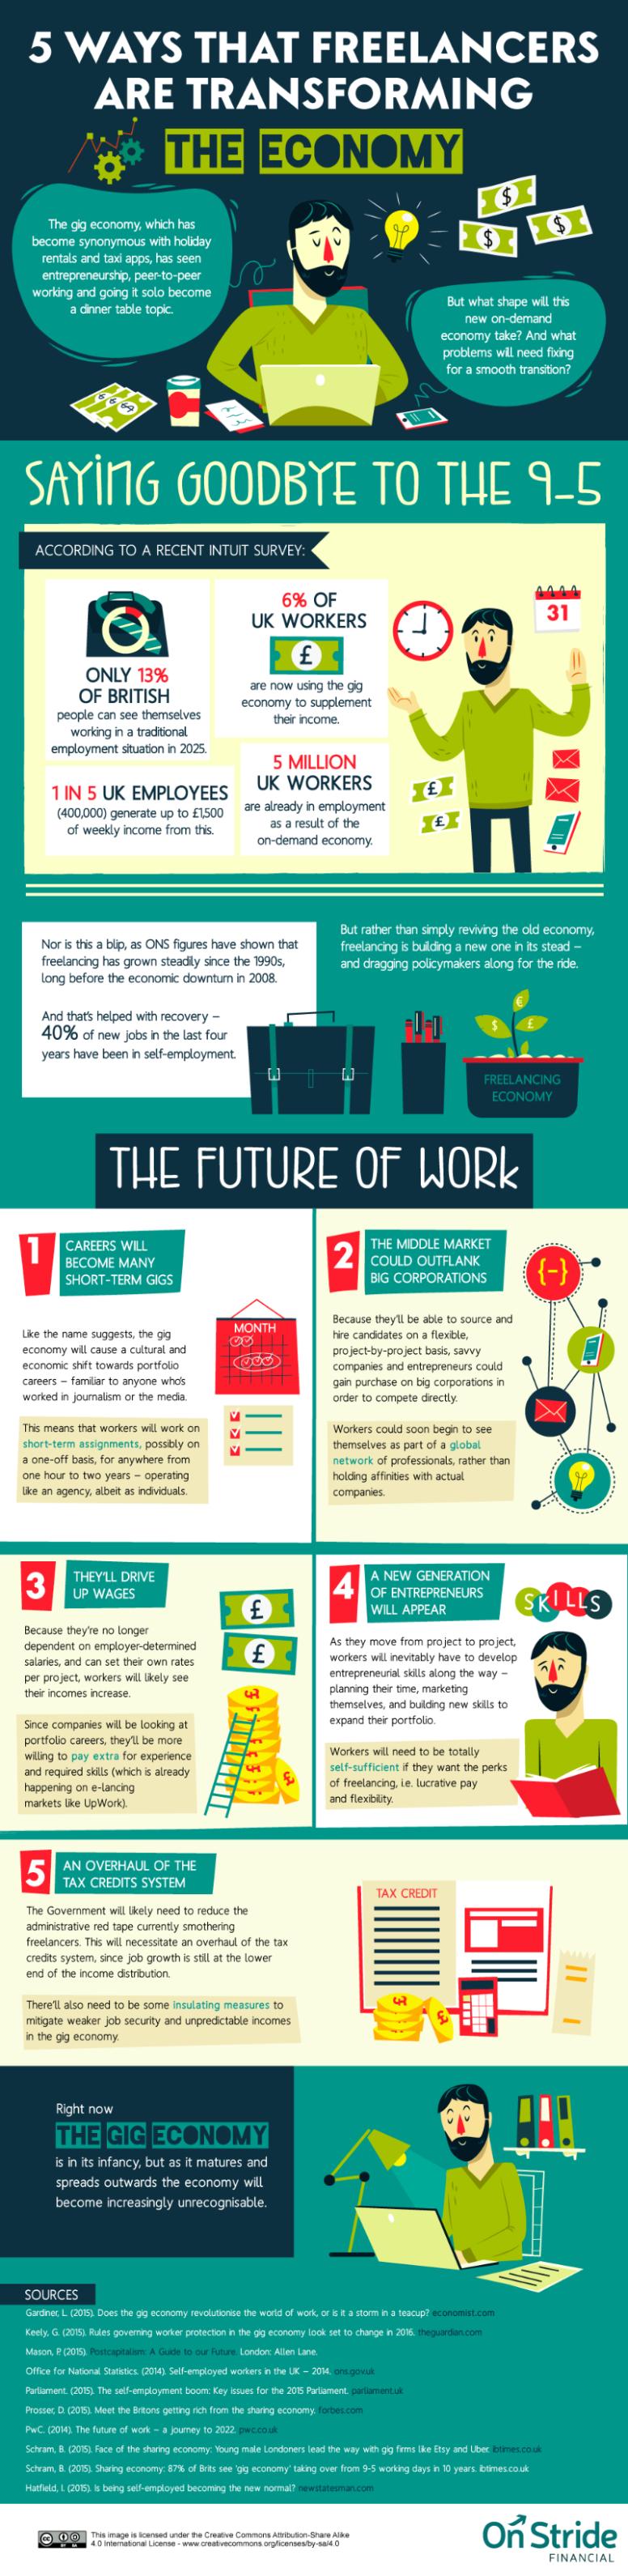 freelancers-transforming-economy